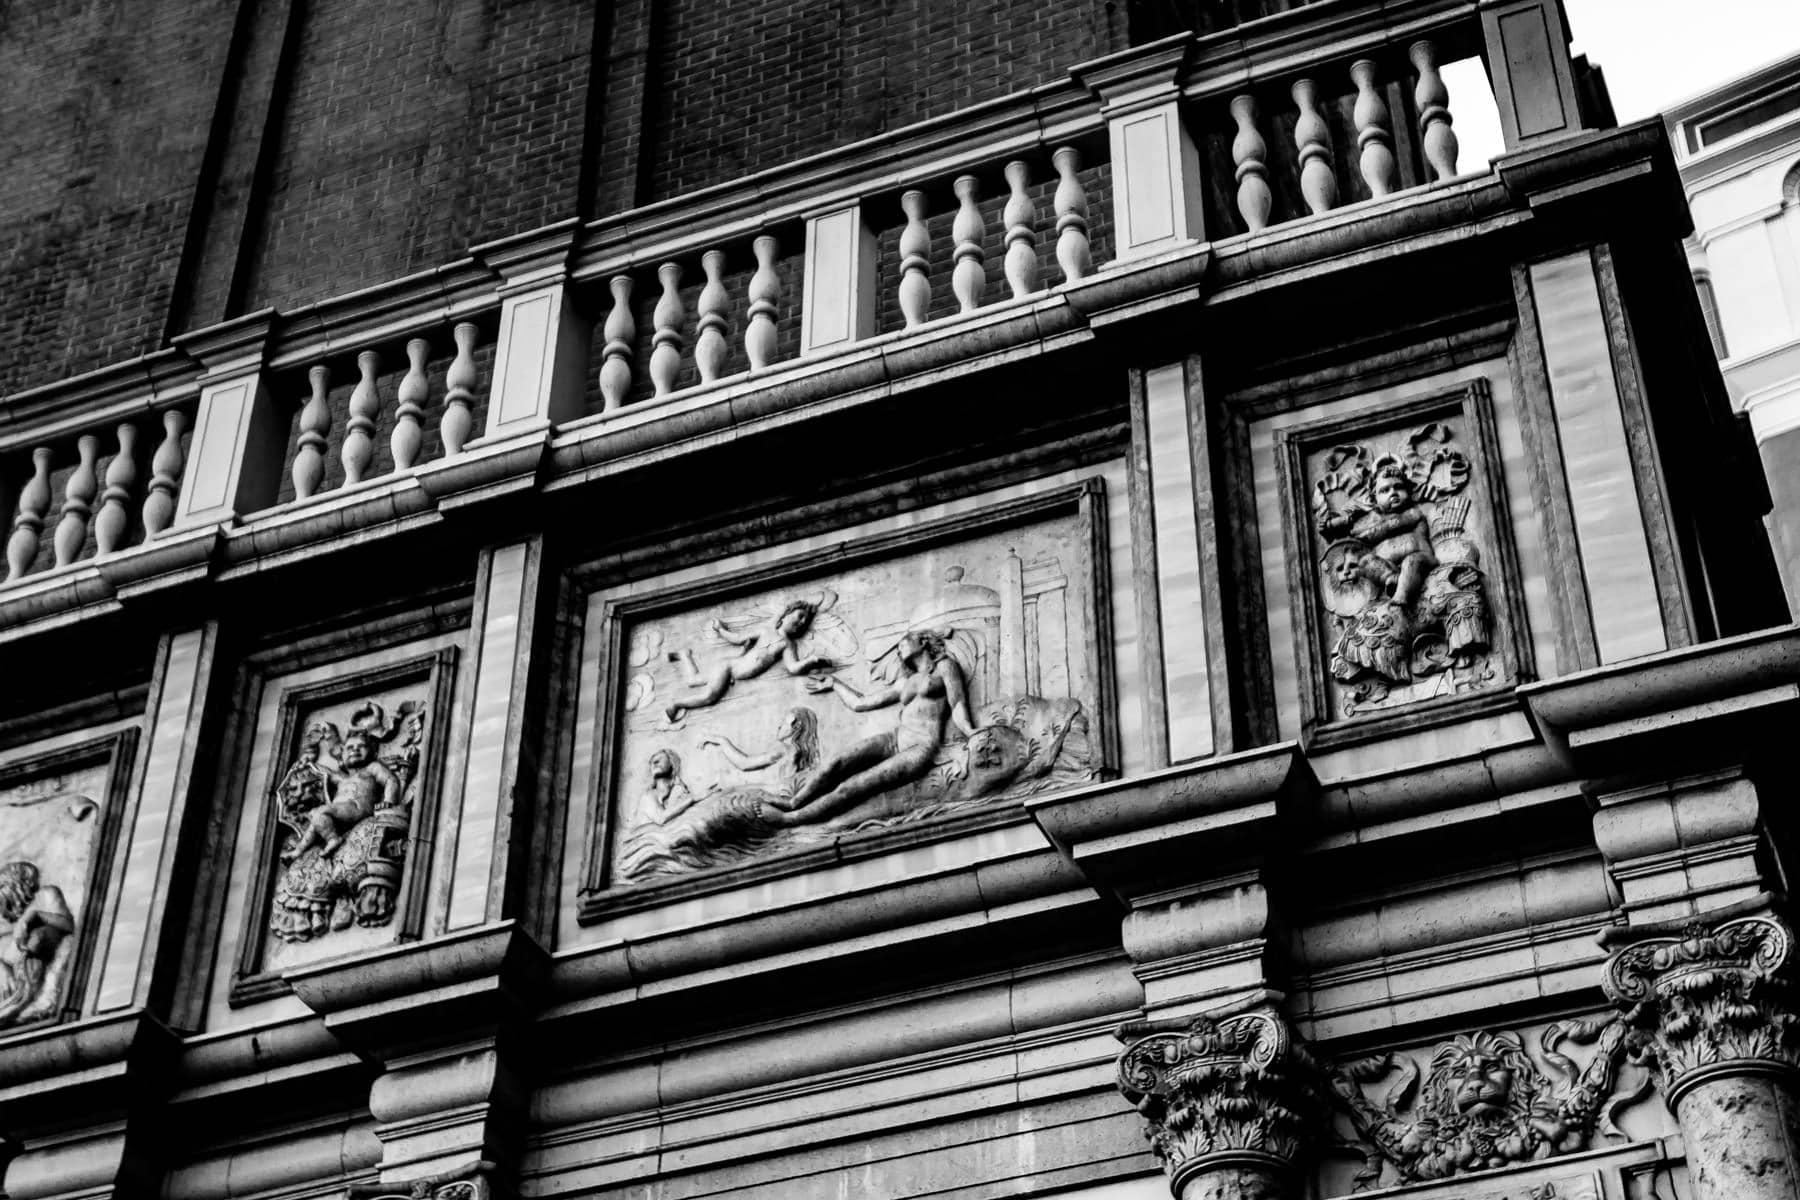 Detail of bas-relief sculptures at The Venetian, Las Vegas.